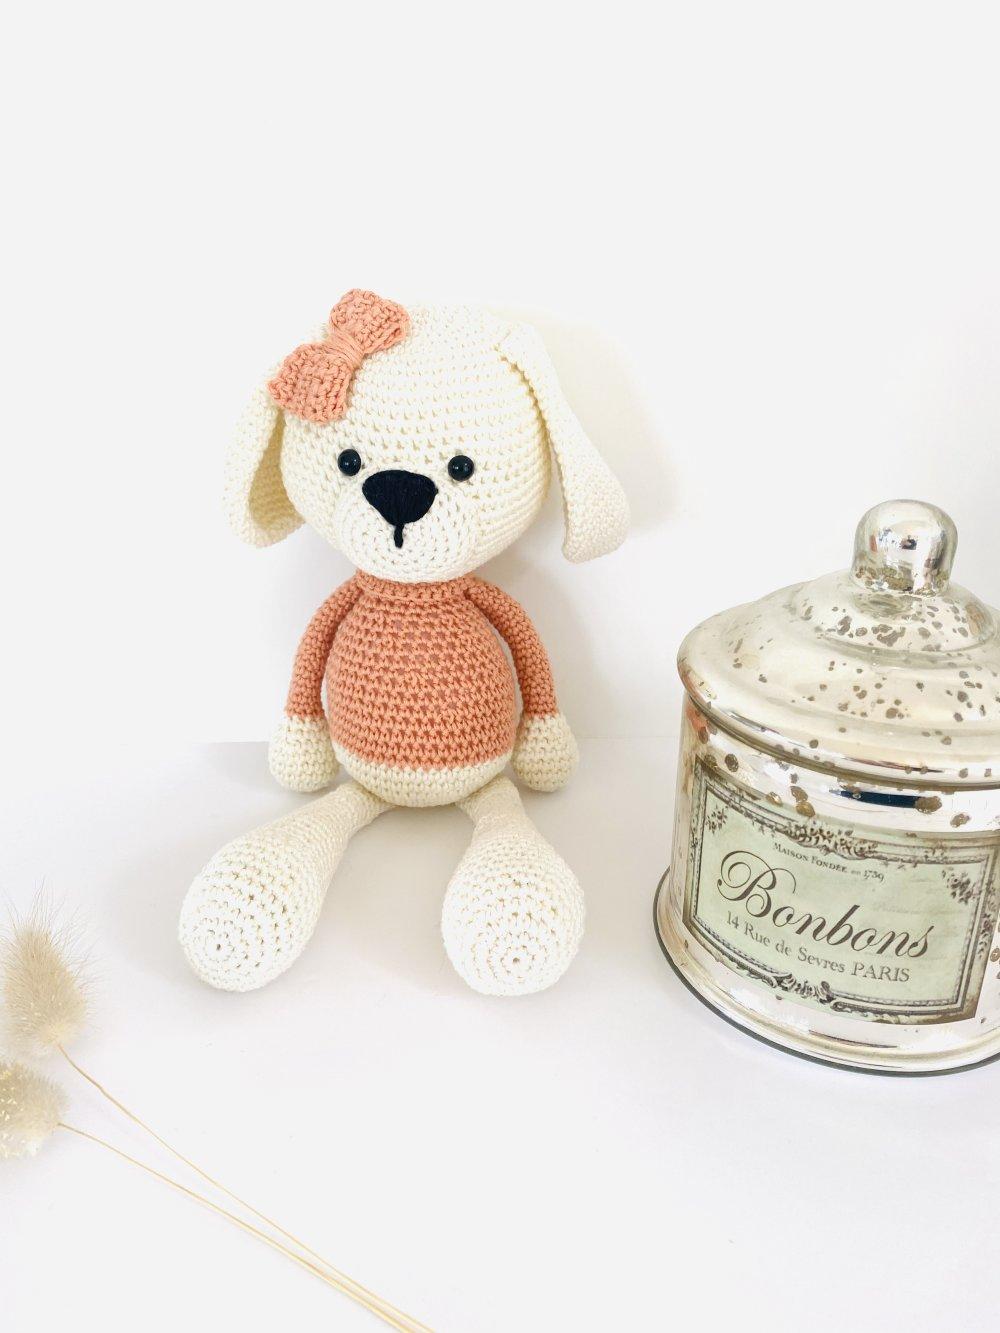 Amigurumi Daisy la chienne cadeau naissance